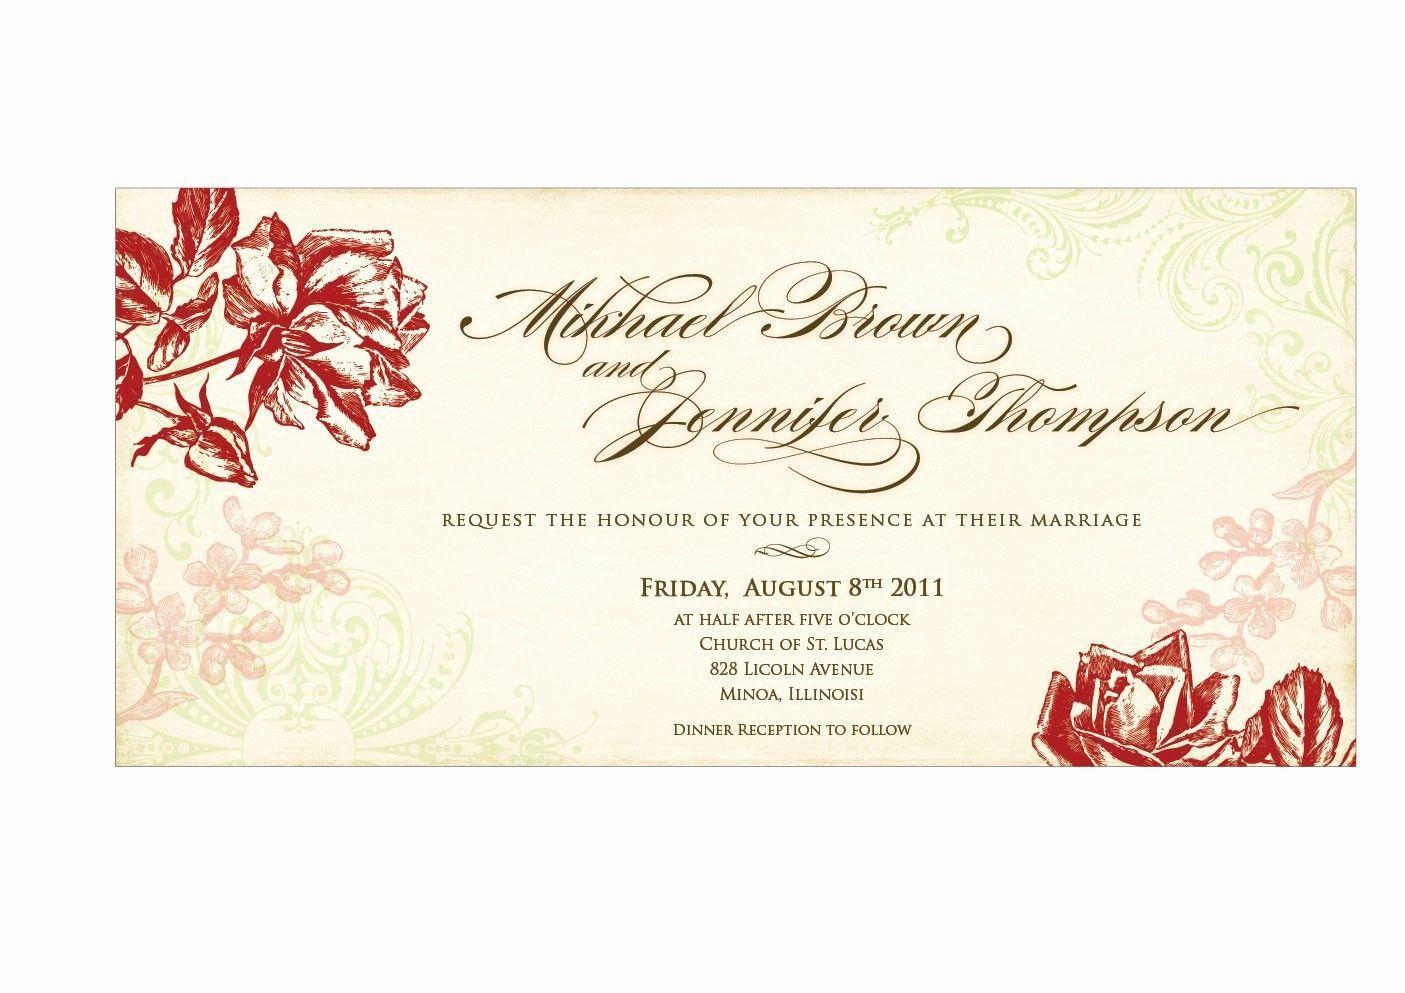 004 Staggering Sample Wedding Invitation Card Template Highest Clarity  Templates Free Design Response WordingFull